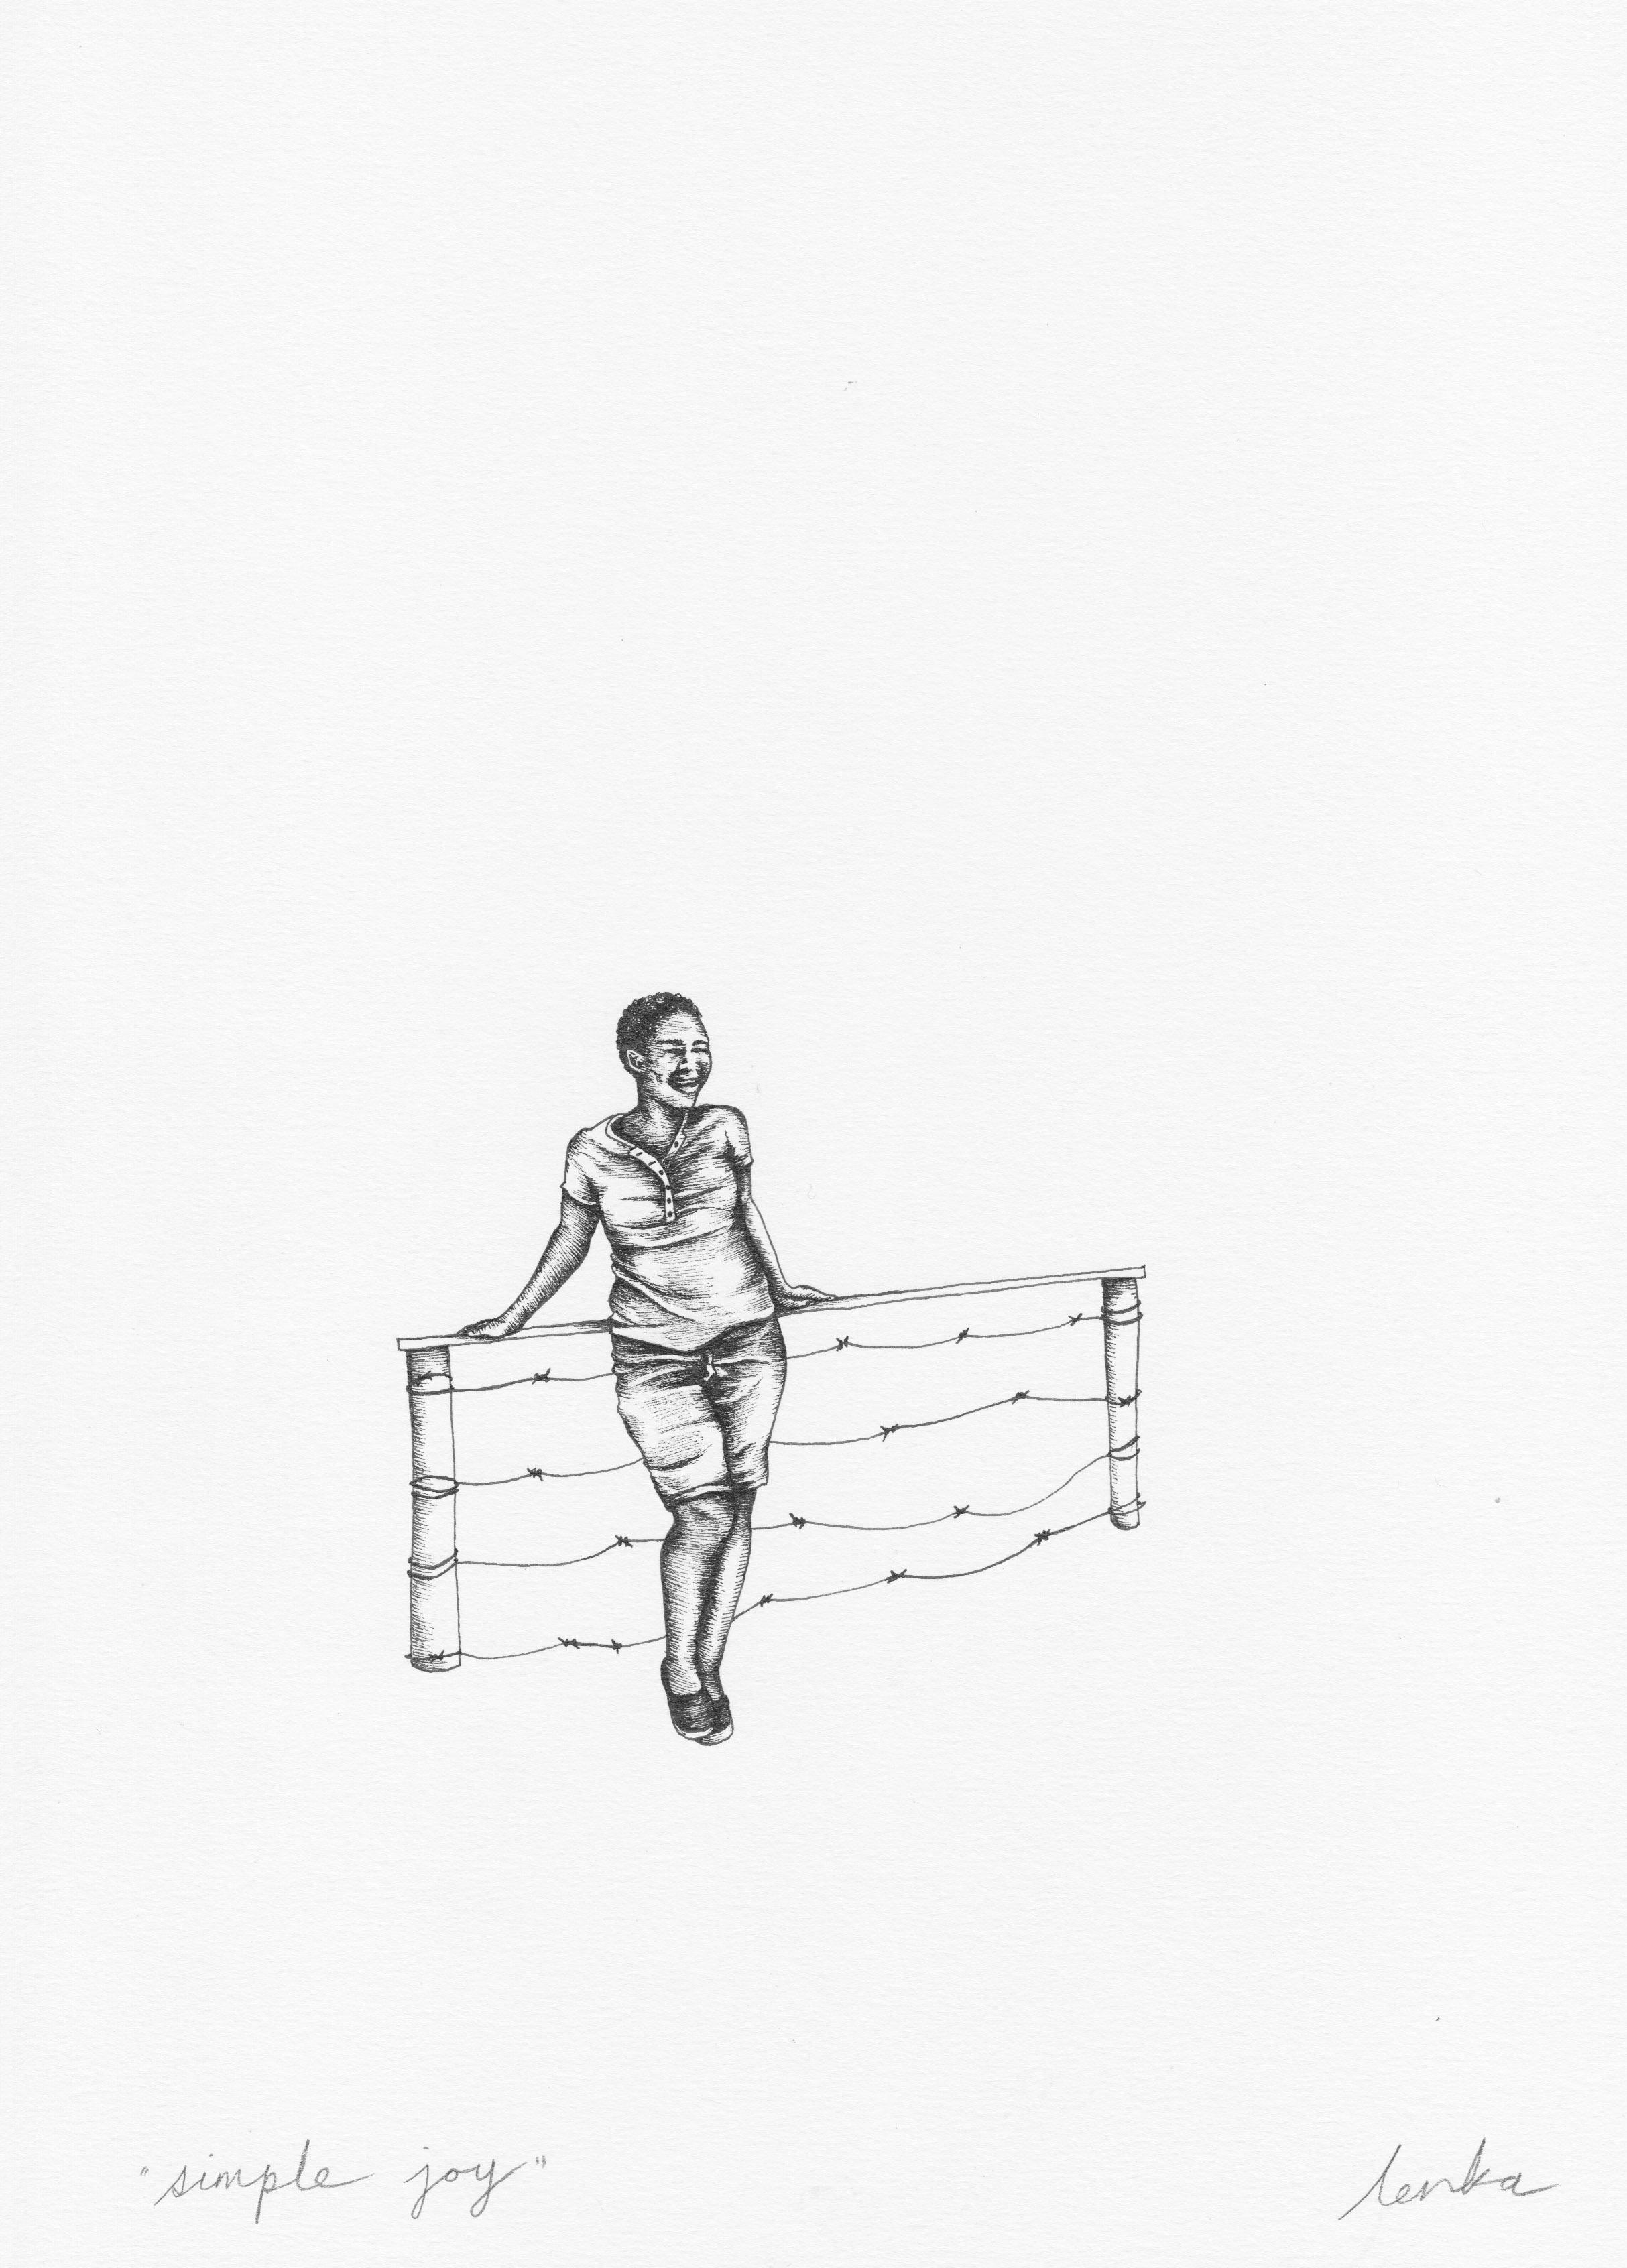 Lenka Cronje – Nr. 2.10 – simple joy